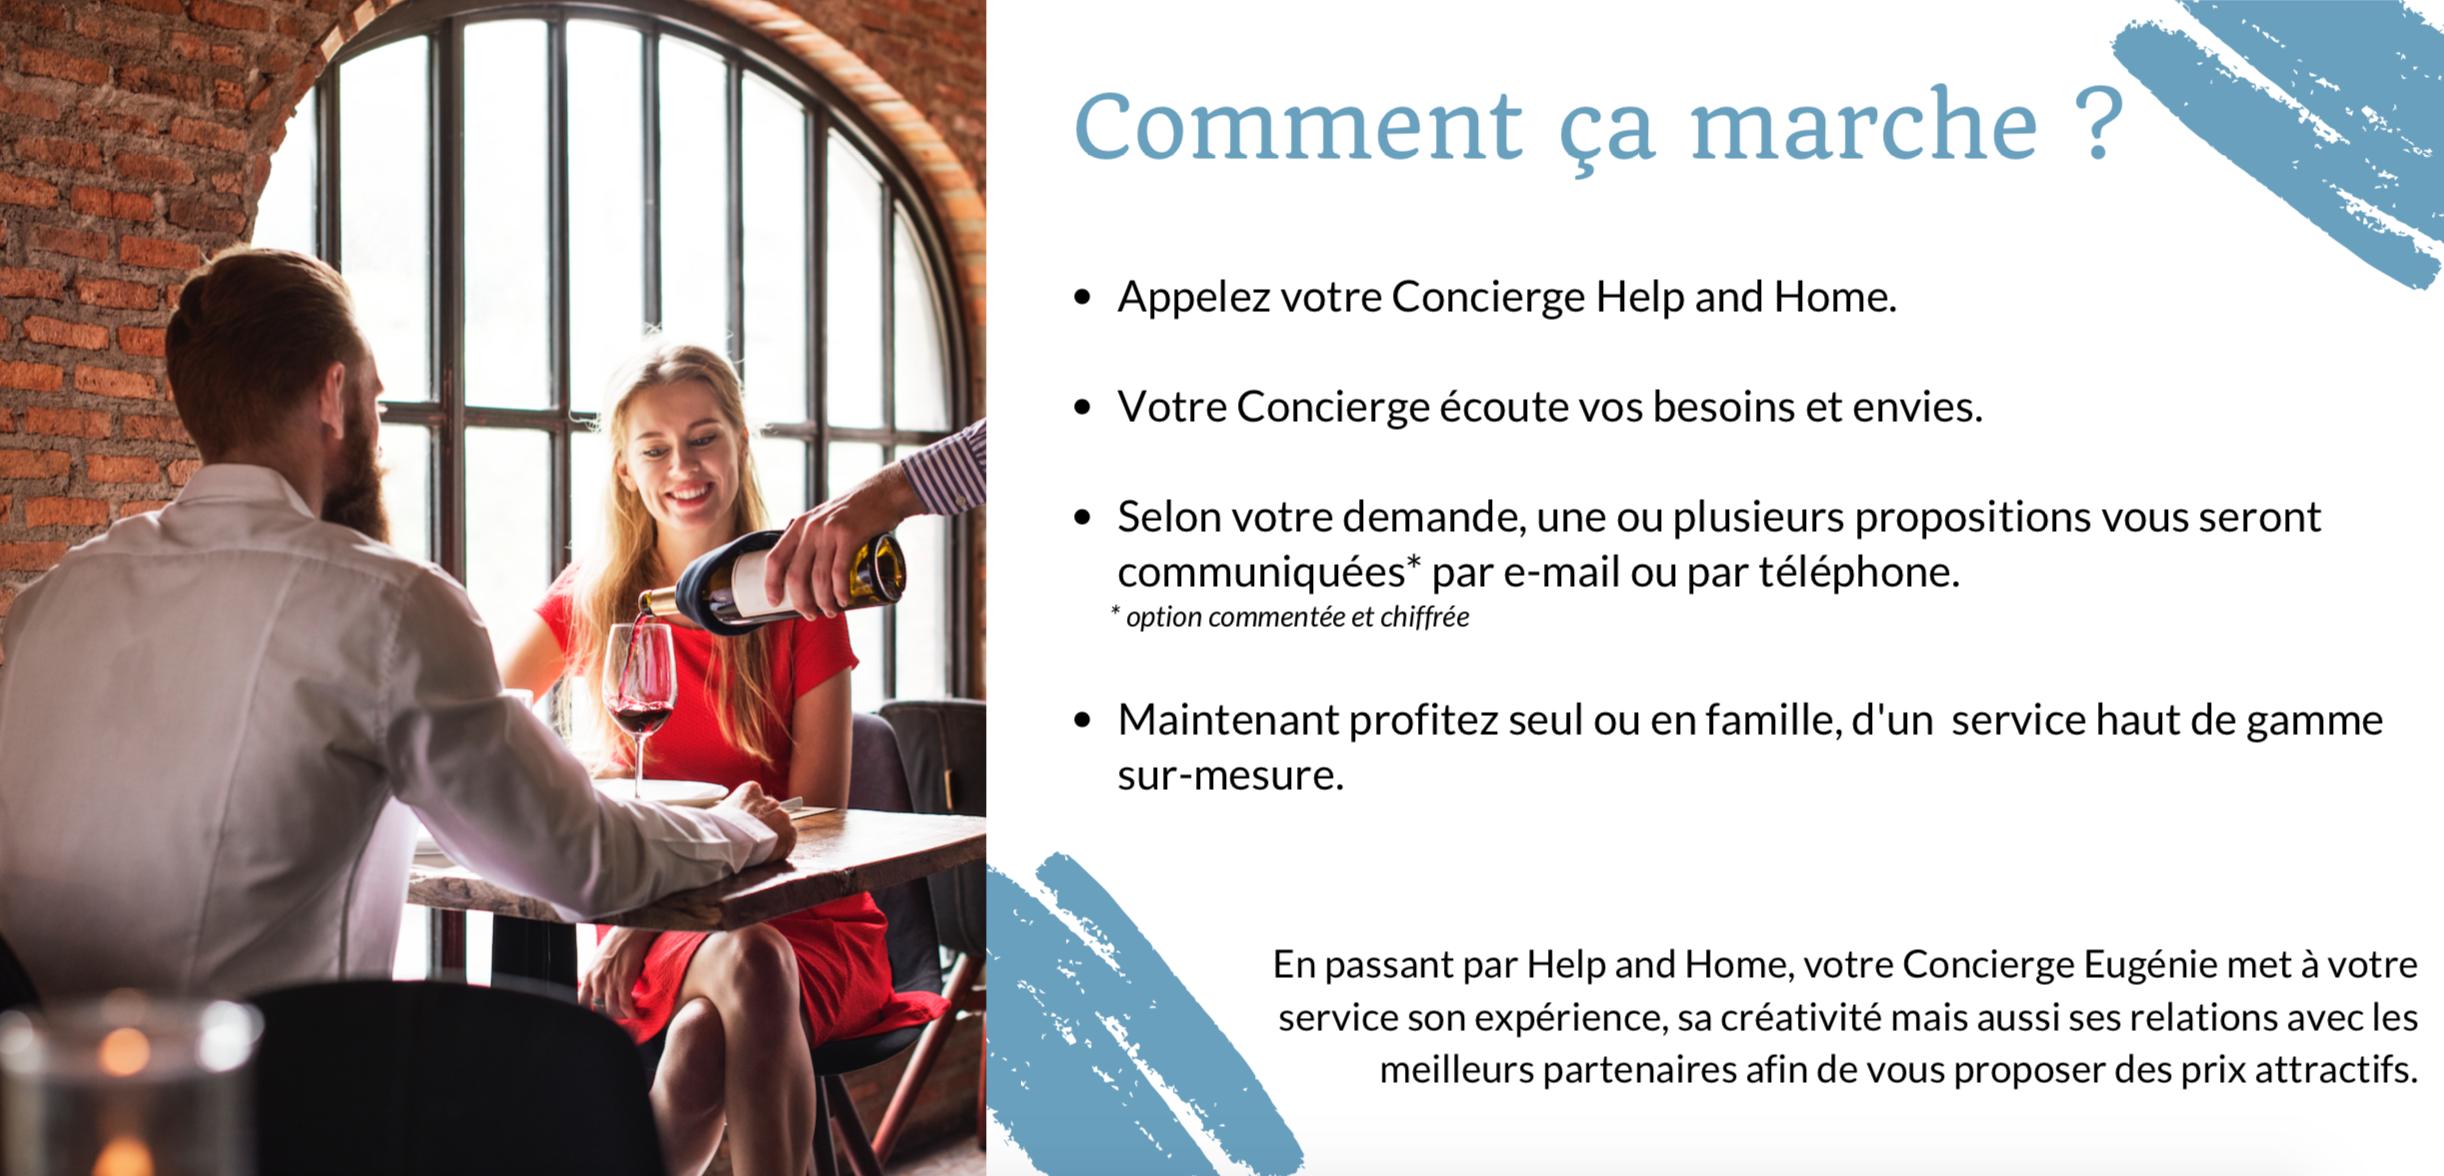 Conciergerie privée - Help and Home